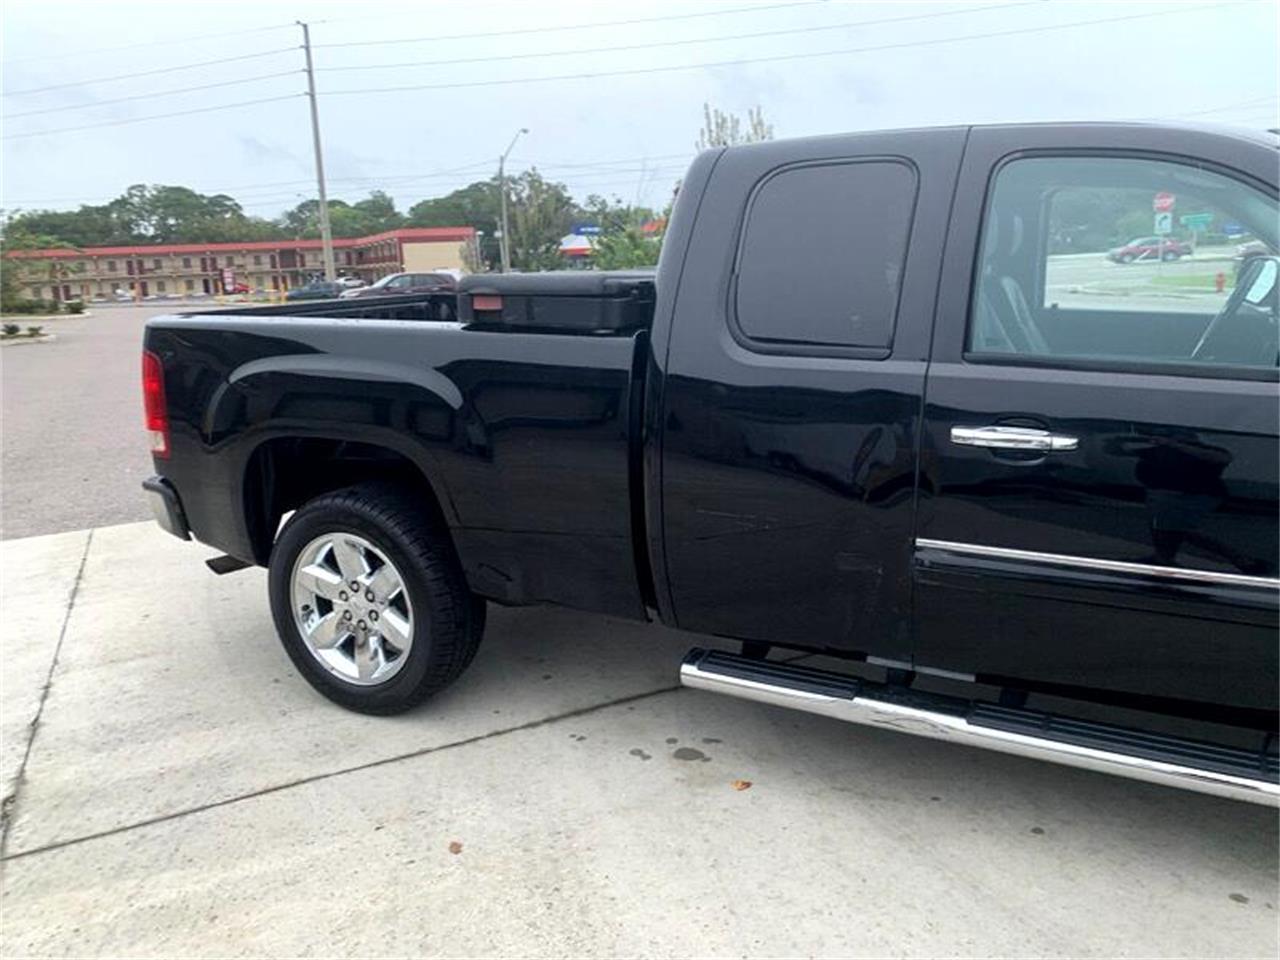 2013 GMC Sierra 1500 (CC-1421452) for sale in Tavares, Florida